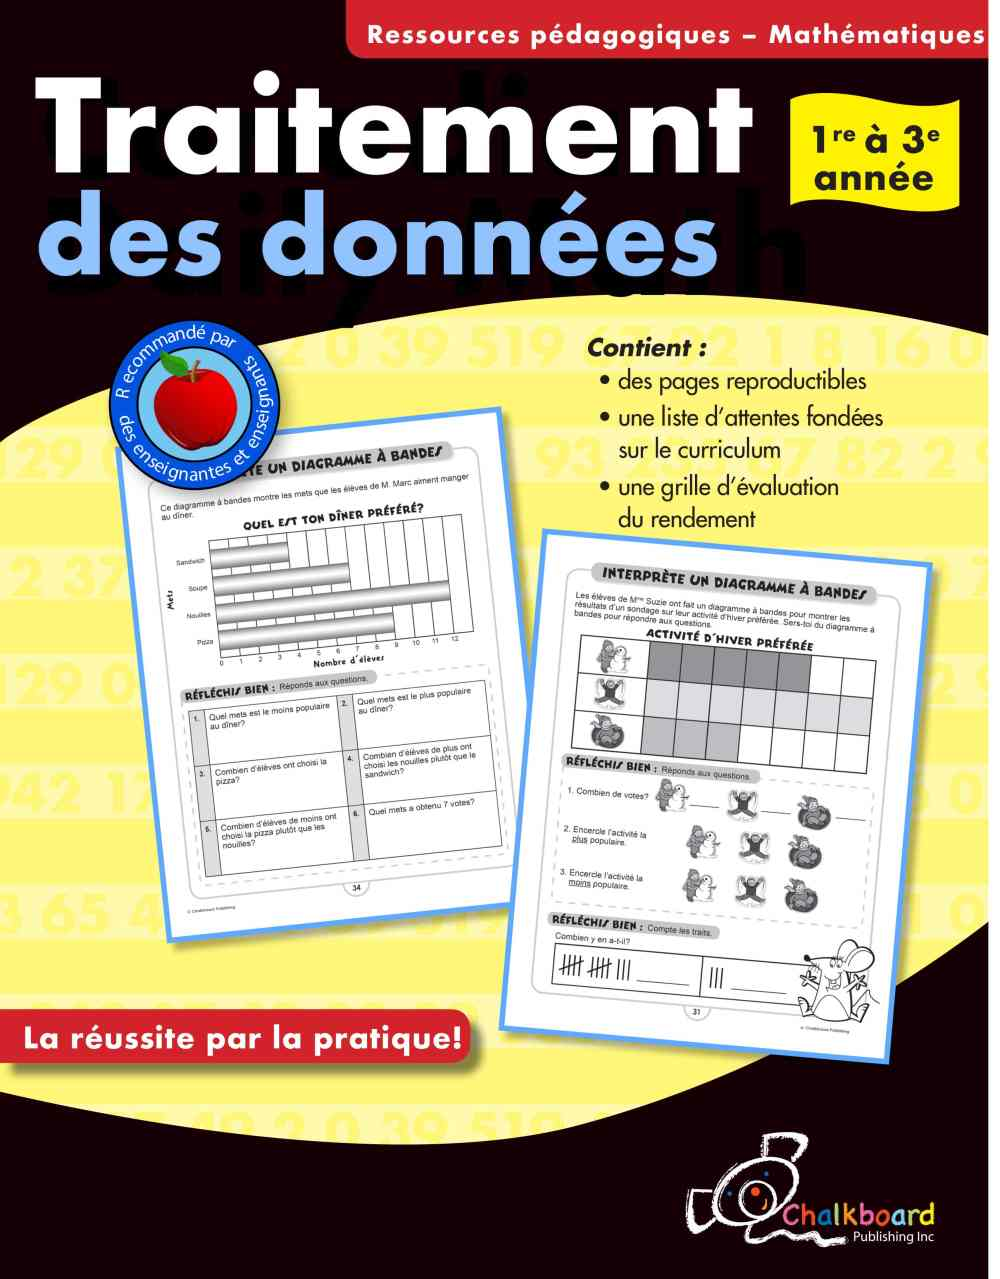 medium resolution of Canadian French Data Management Activities Grades 1-3 - eBook - Chalkboard  Publishing